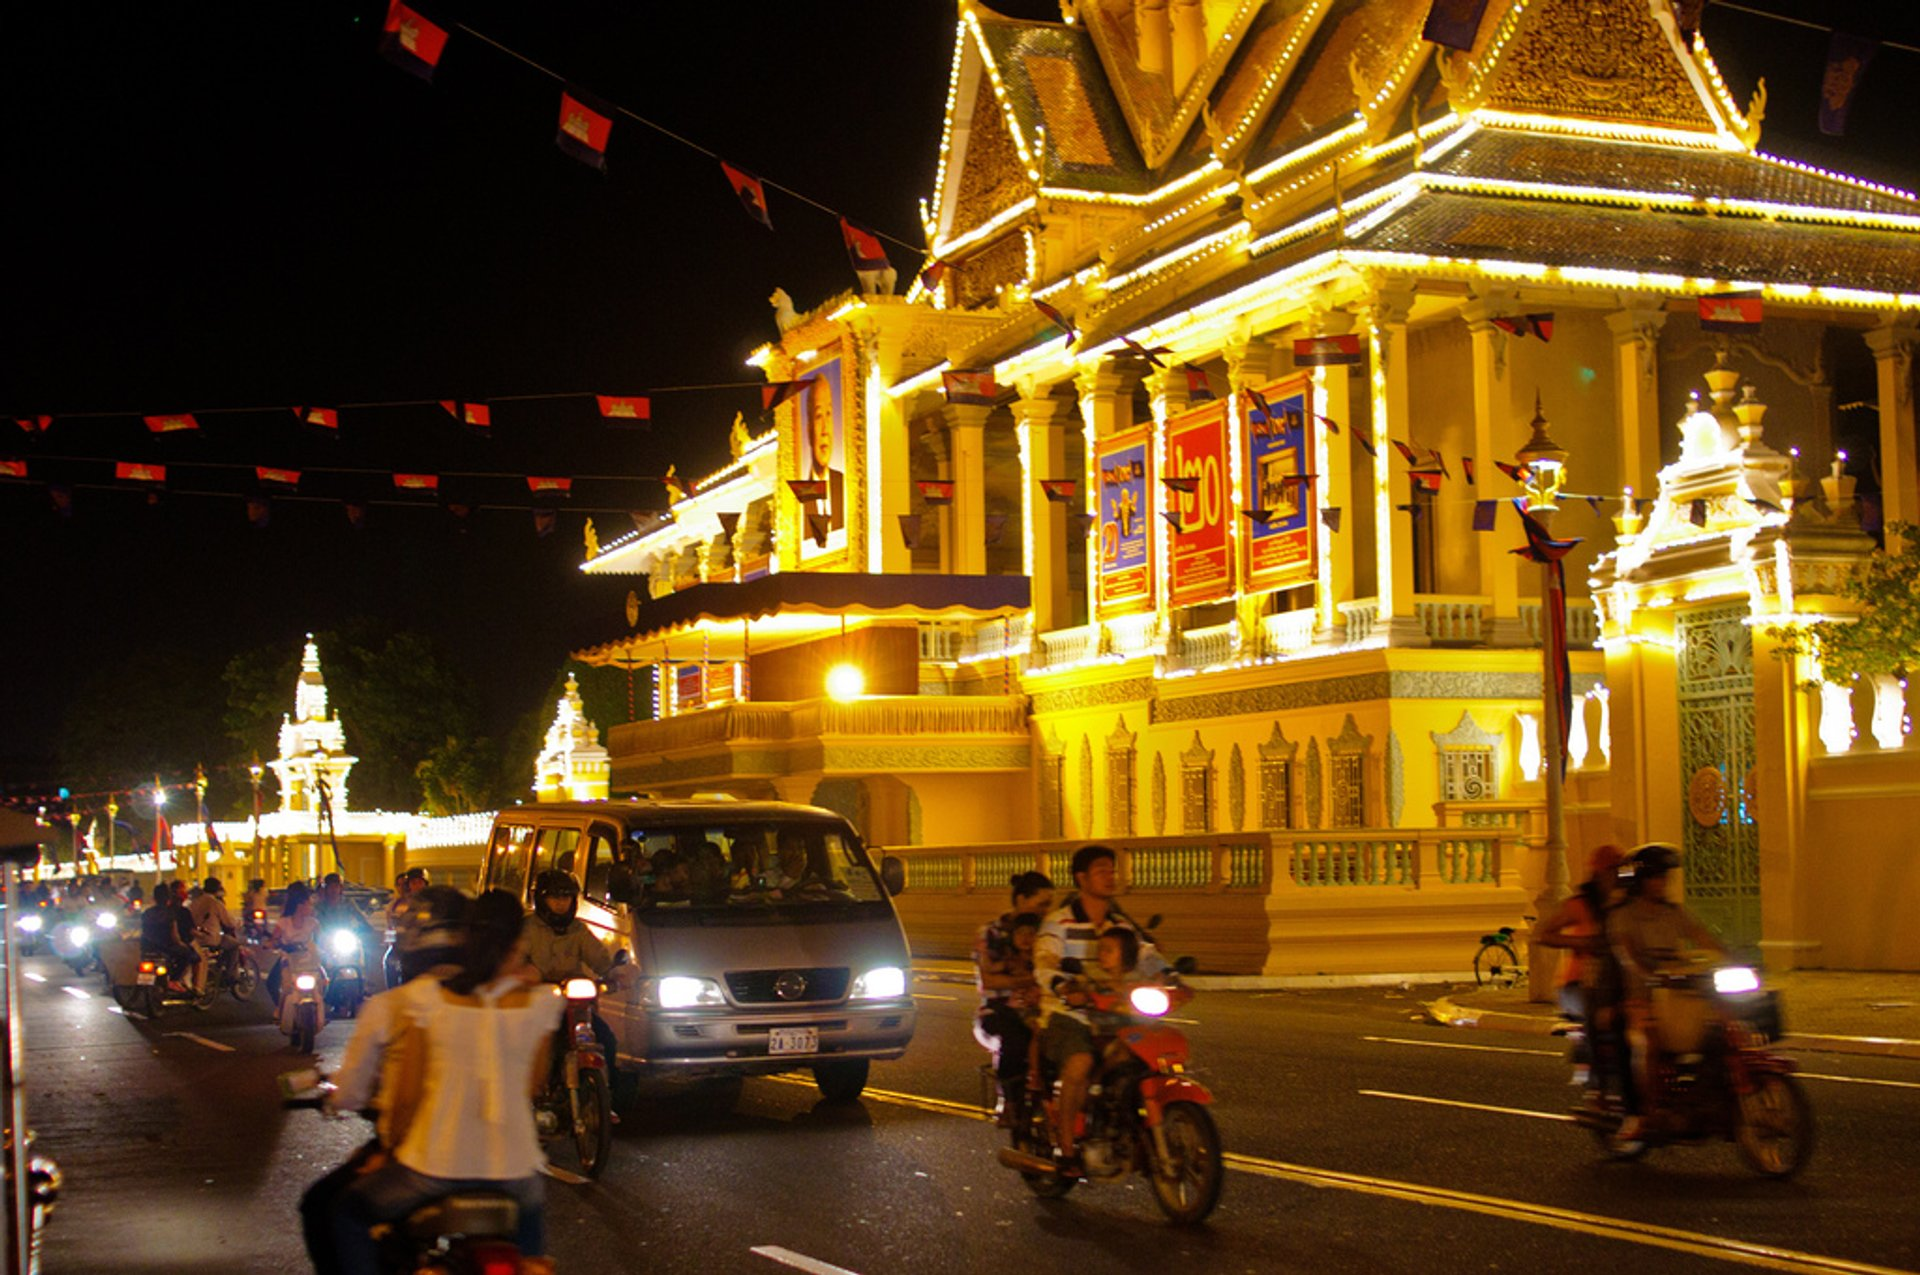 King's Birthday Celebration in Cambodia - Best Season 2020